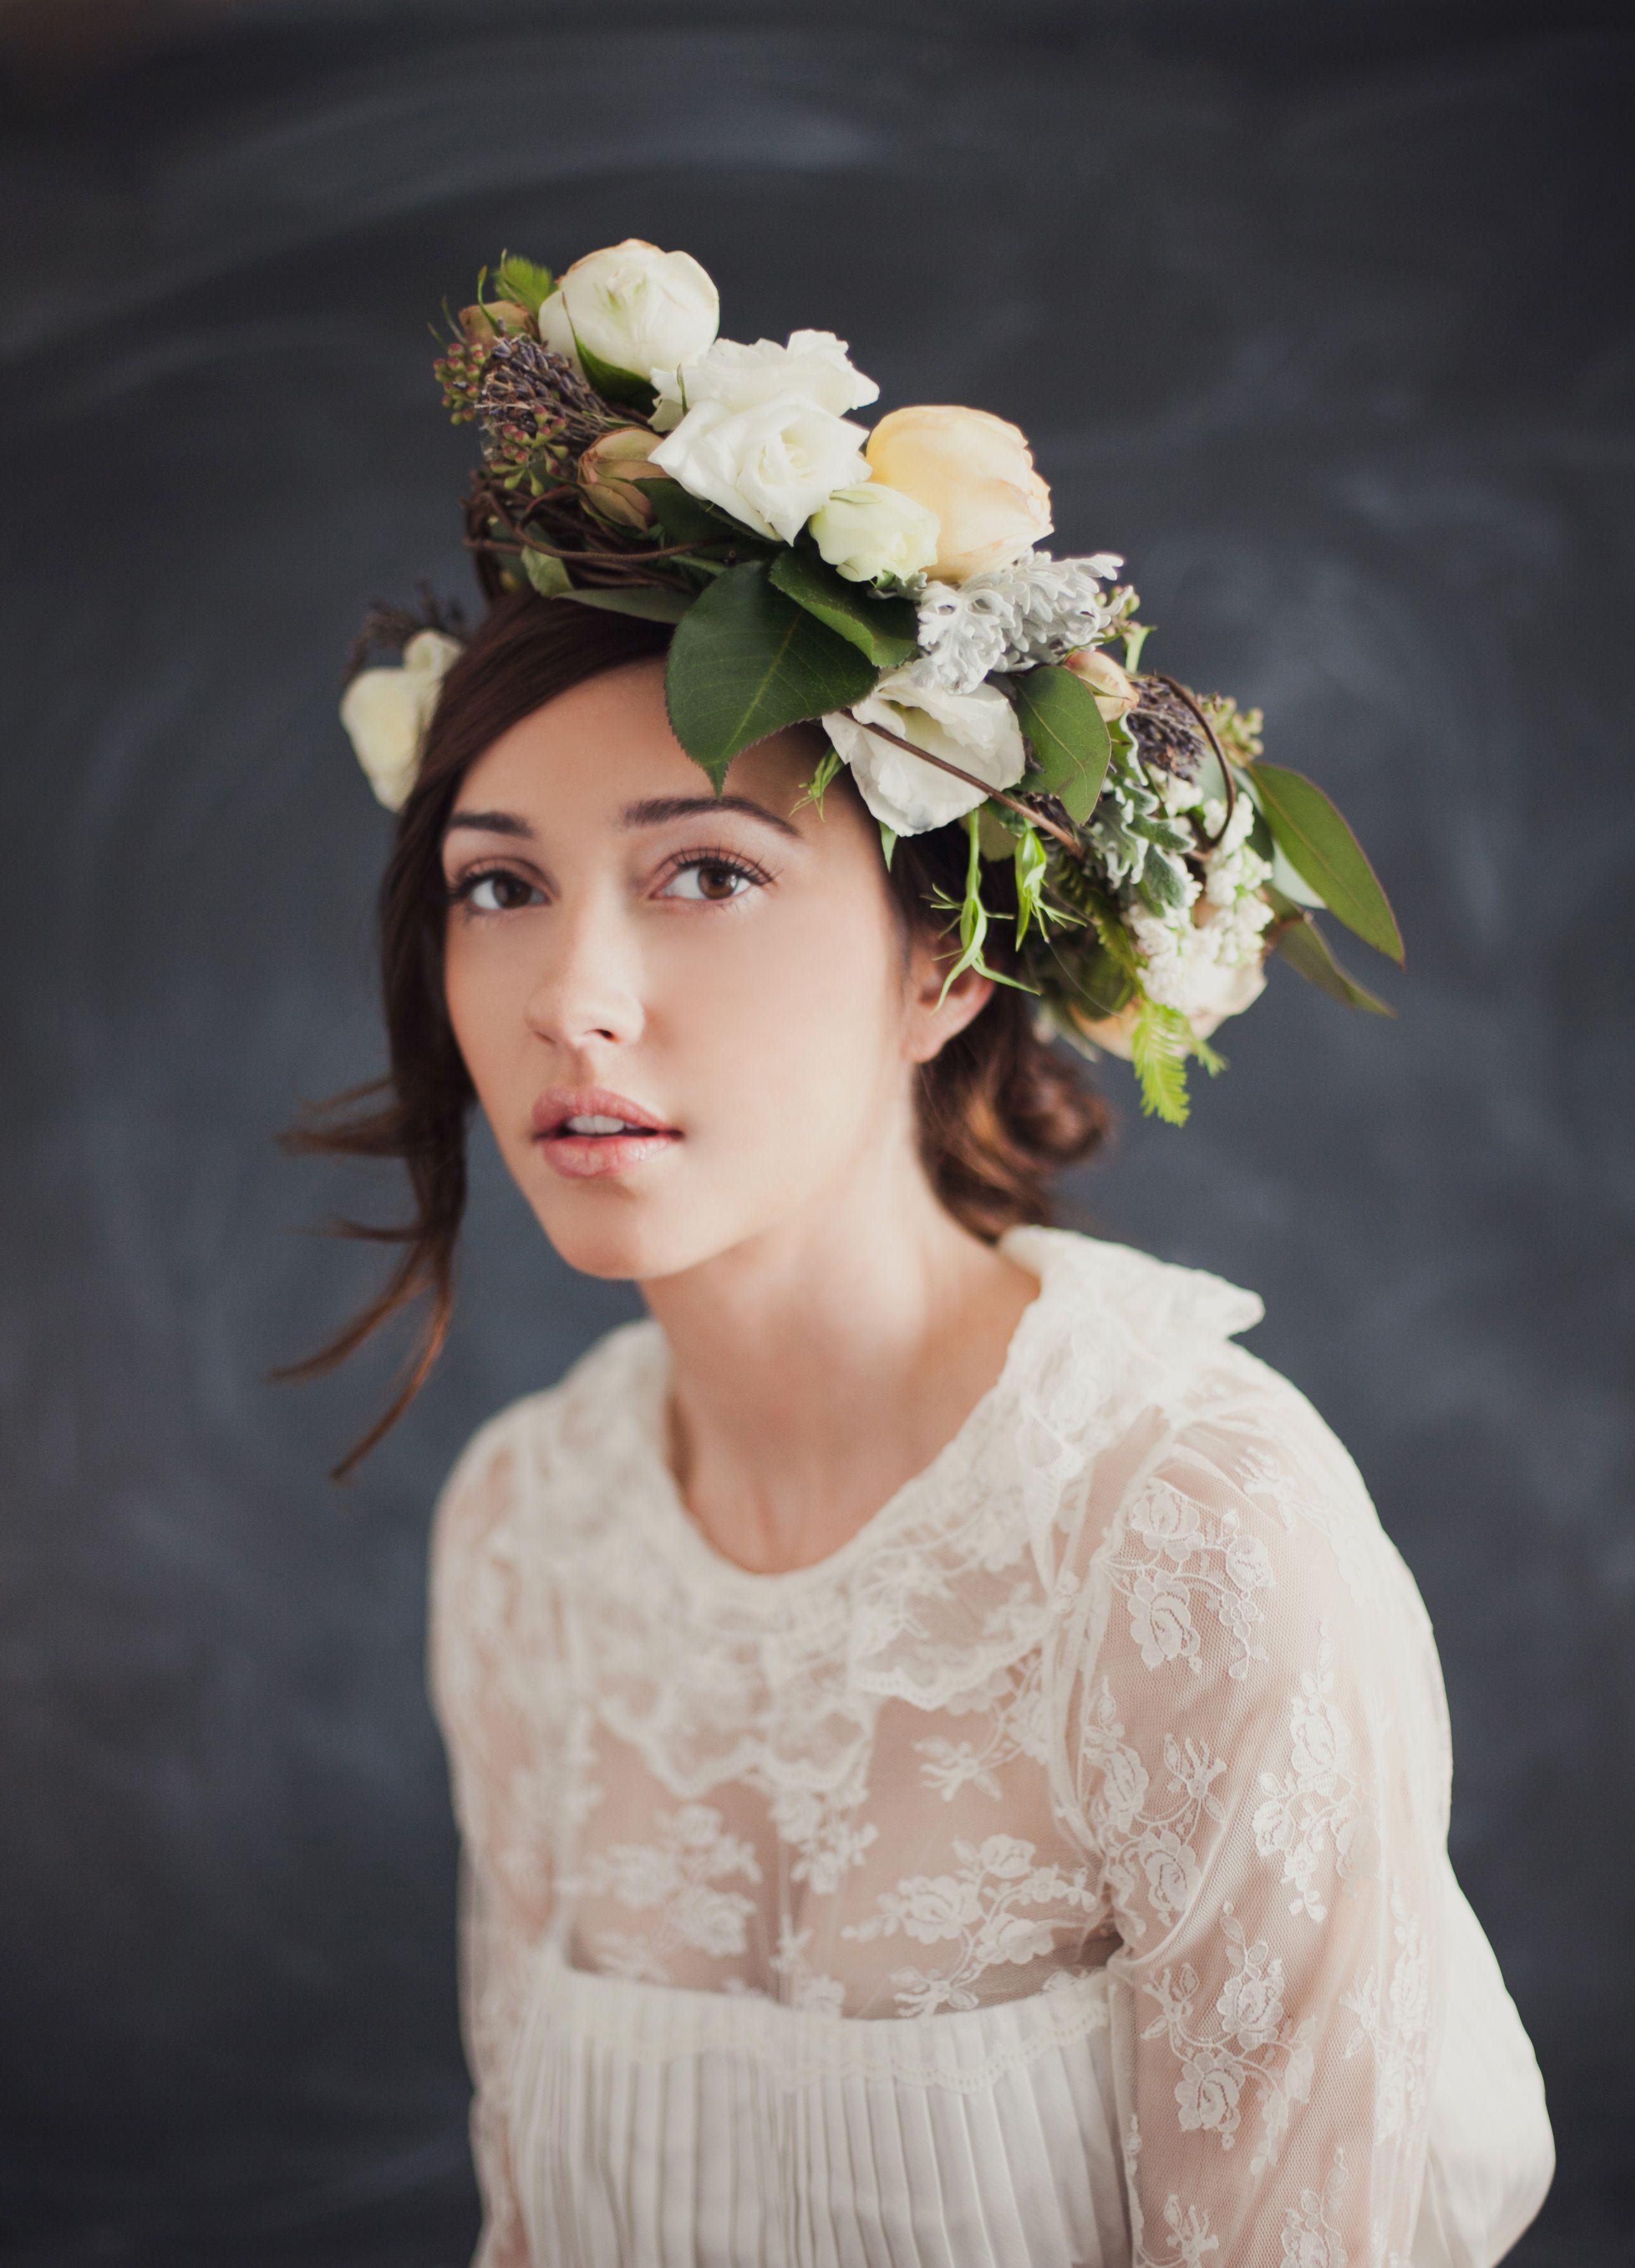 Floral piece the consevatorie model megan henderson hairmu brides romantic white and blush flower crown photo by ben sasso photography izmirmasajfo